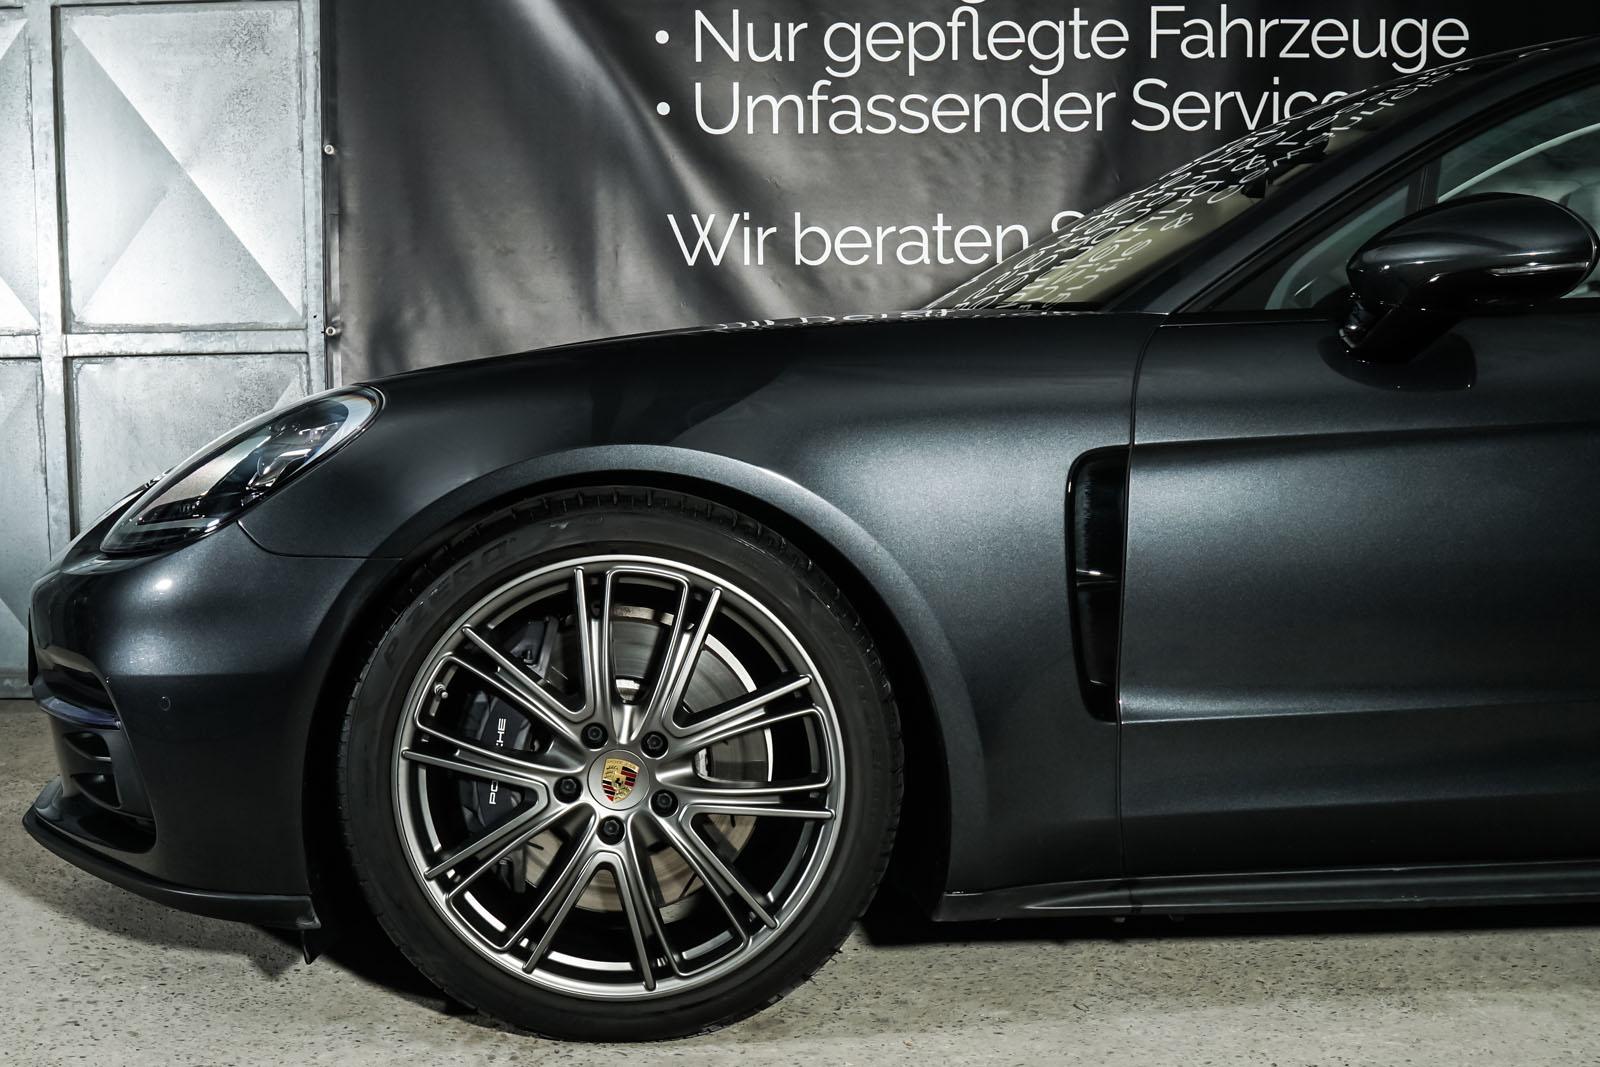 Porsche_Panamera4_SportTurismo_Grau_Weißgrau_POR-0979_4_w